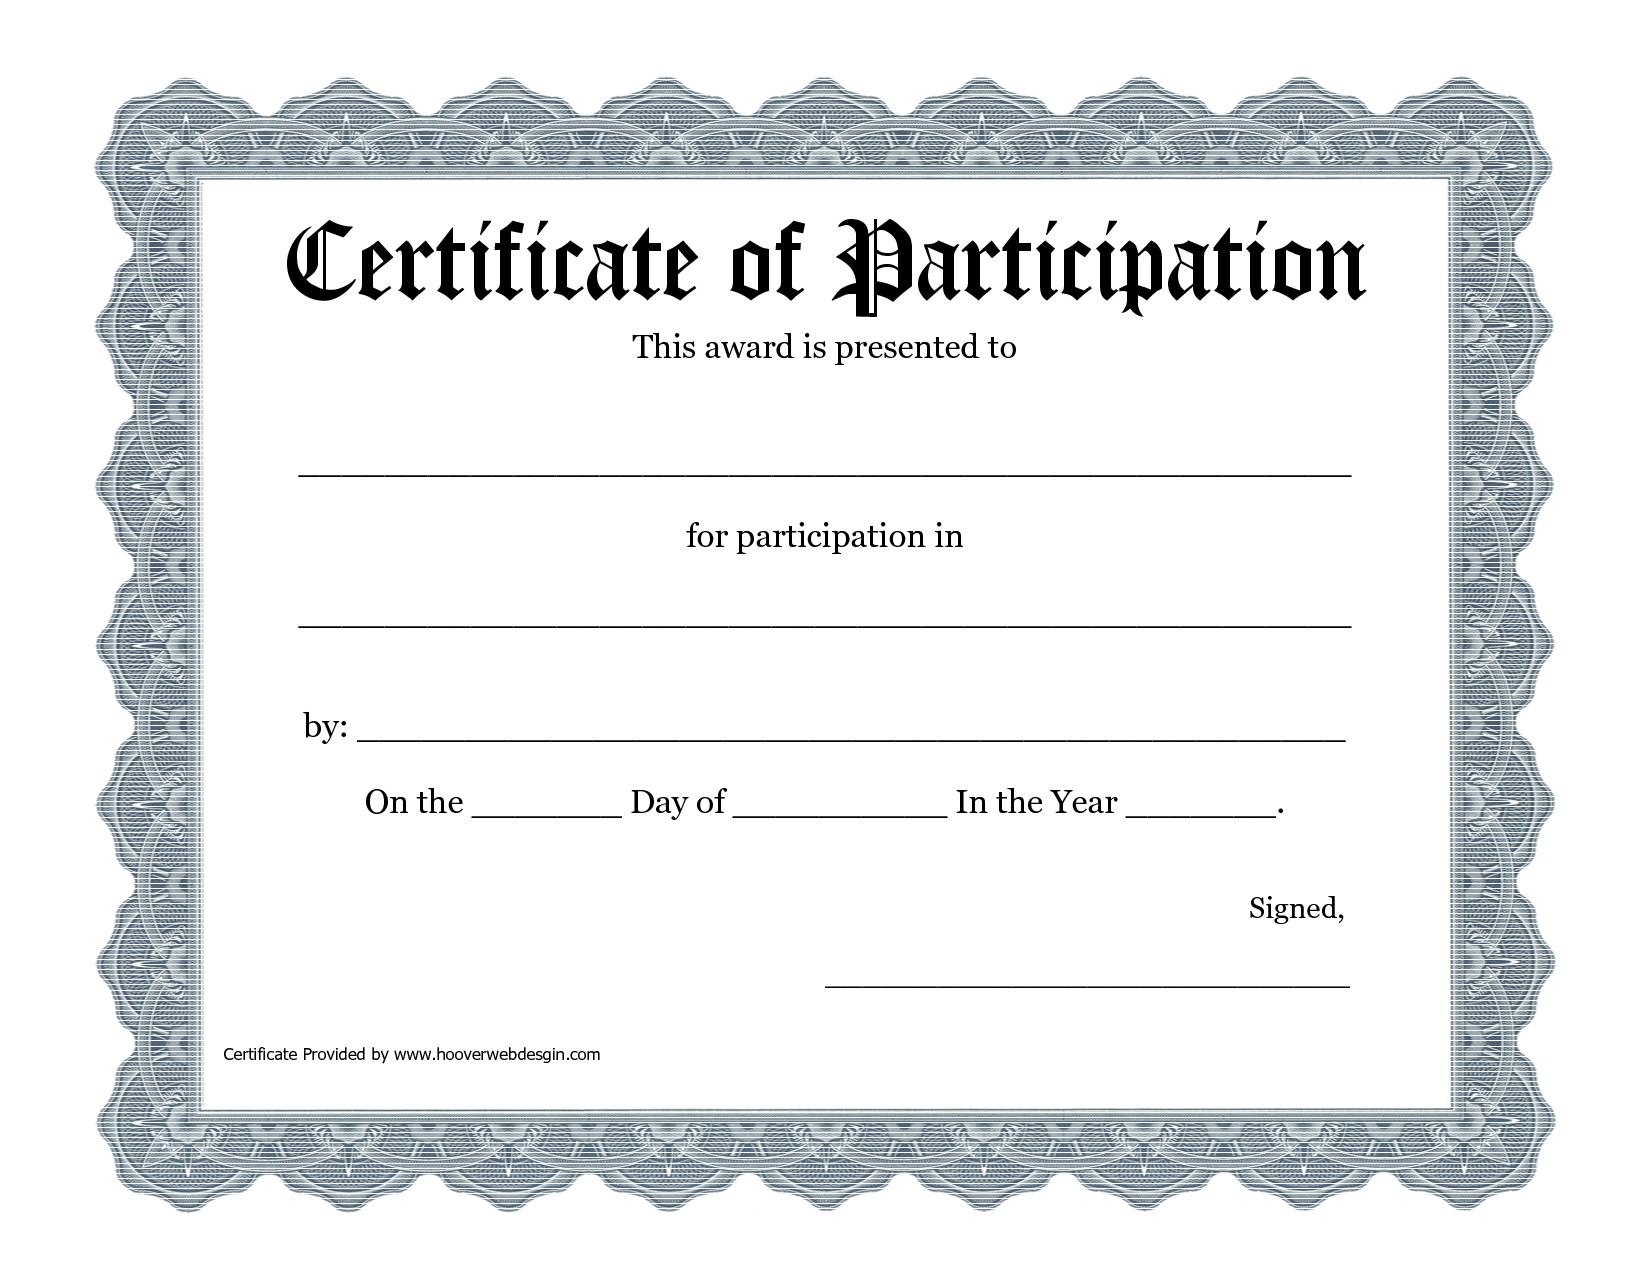 Free Printable Award Certificate Template - Bing Images | 2016 Art - Free Printable Blank Certificate Templates